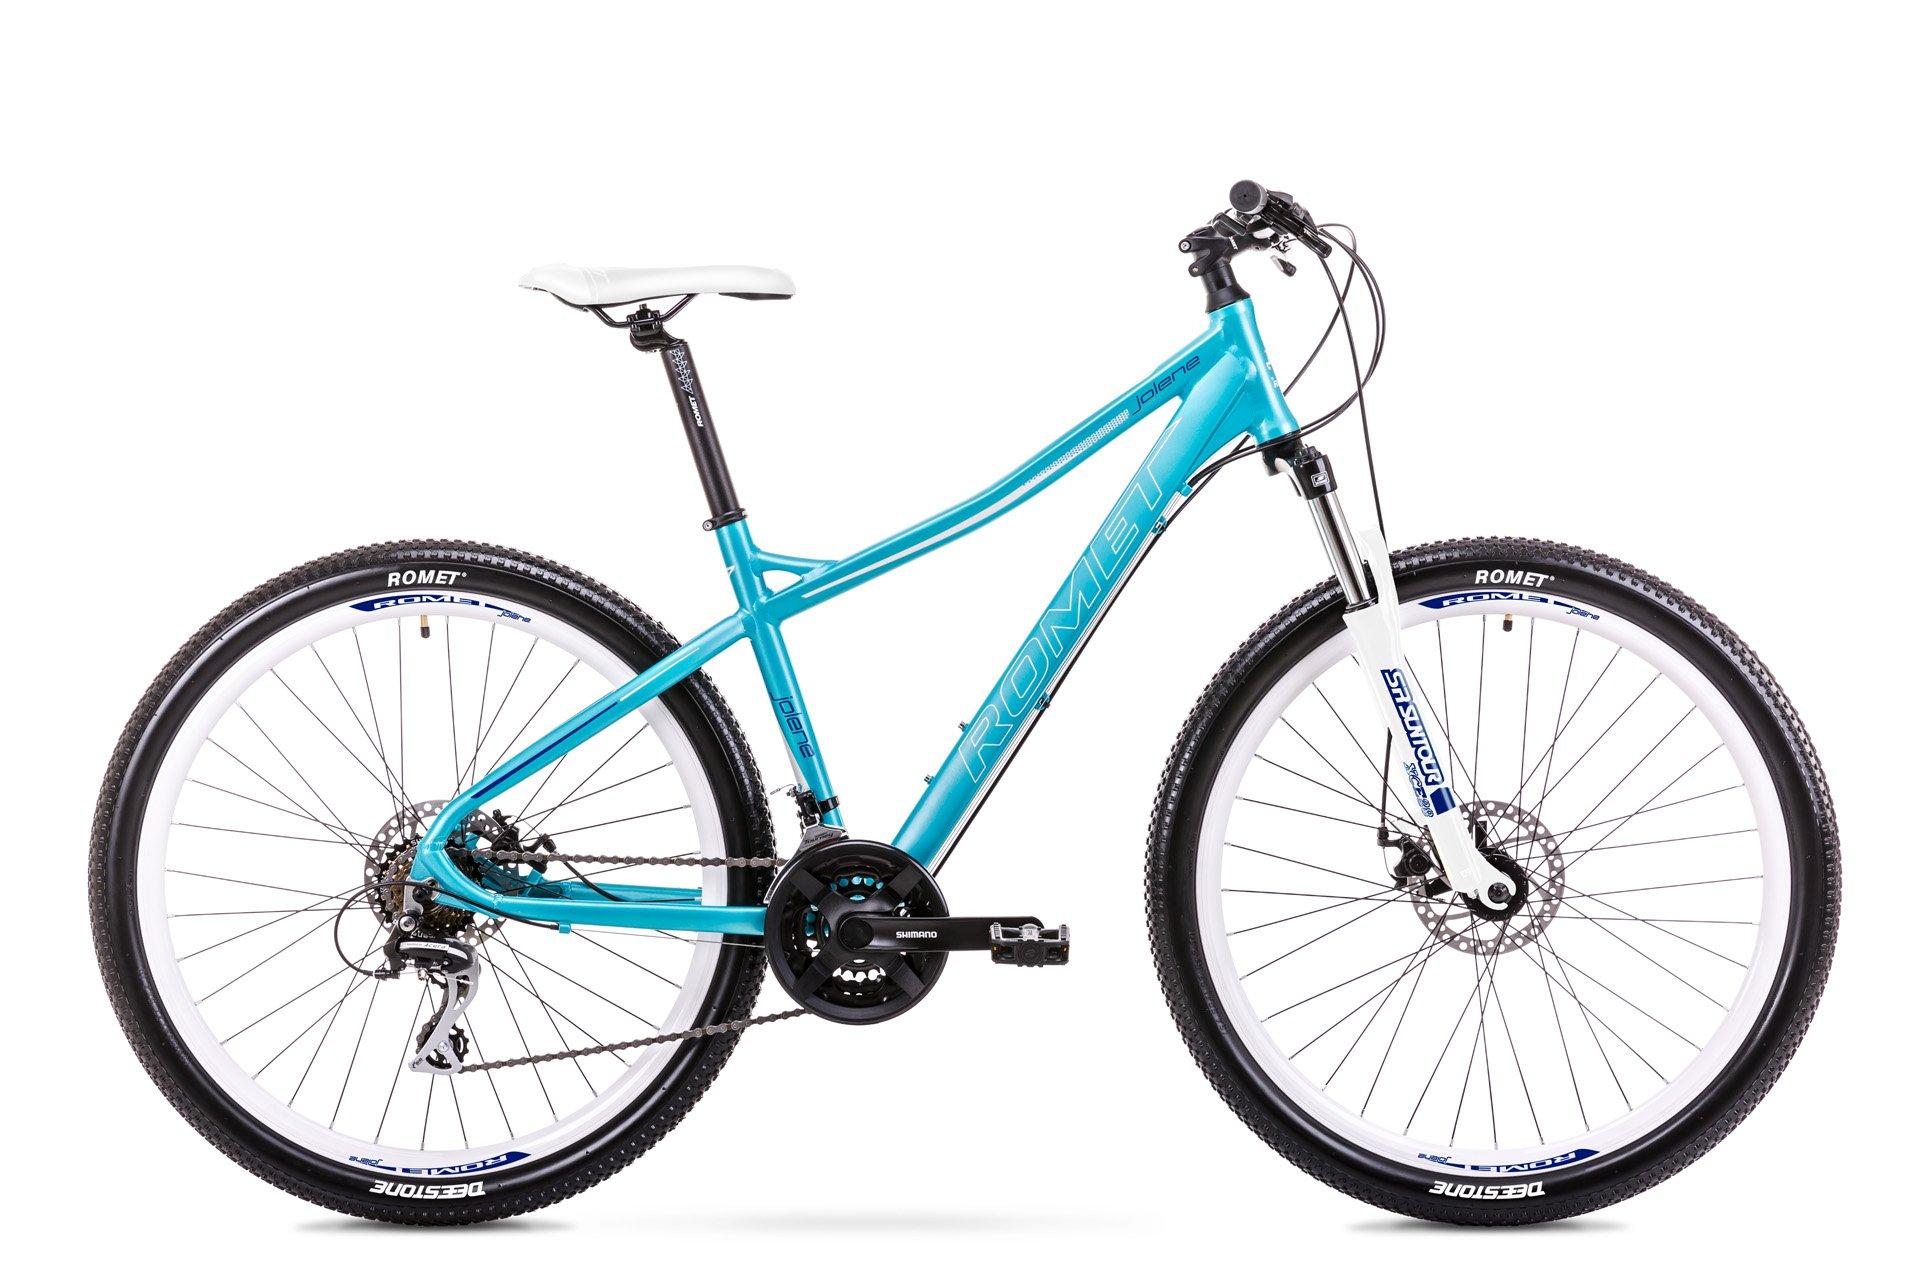 Romet Jolene 7.1 27,5 21speed Acera-mix Blå/hvid | Mountainbikes